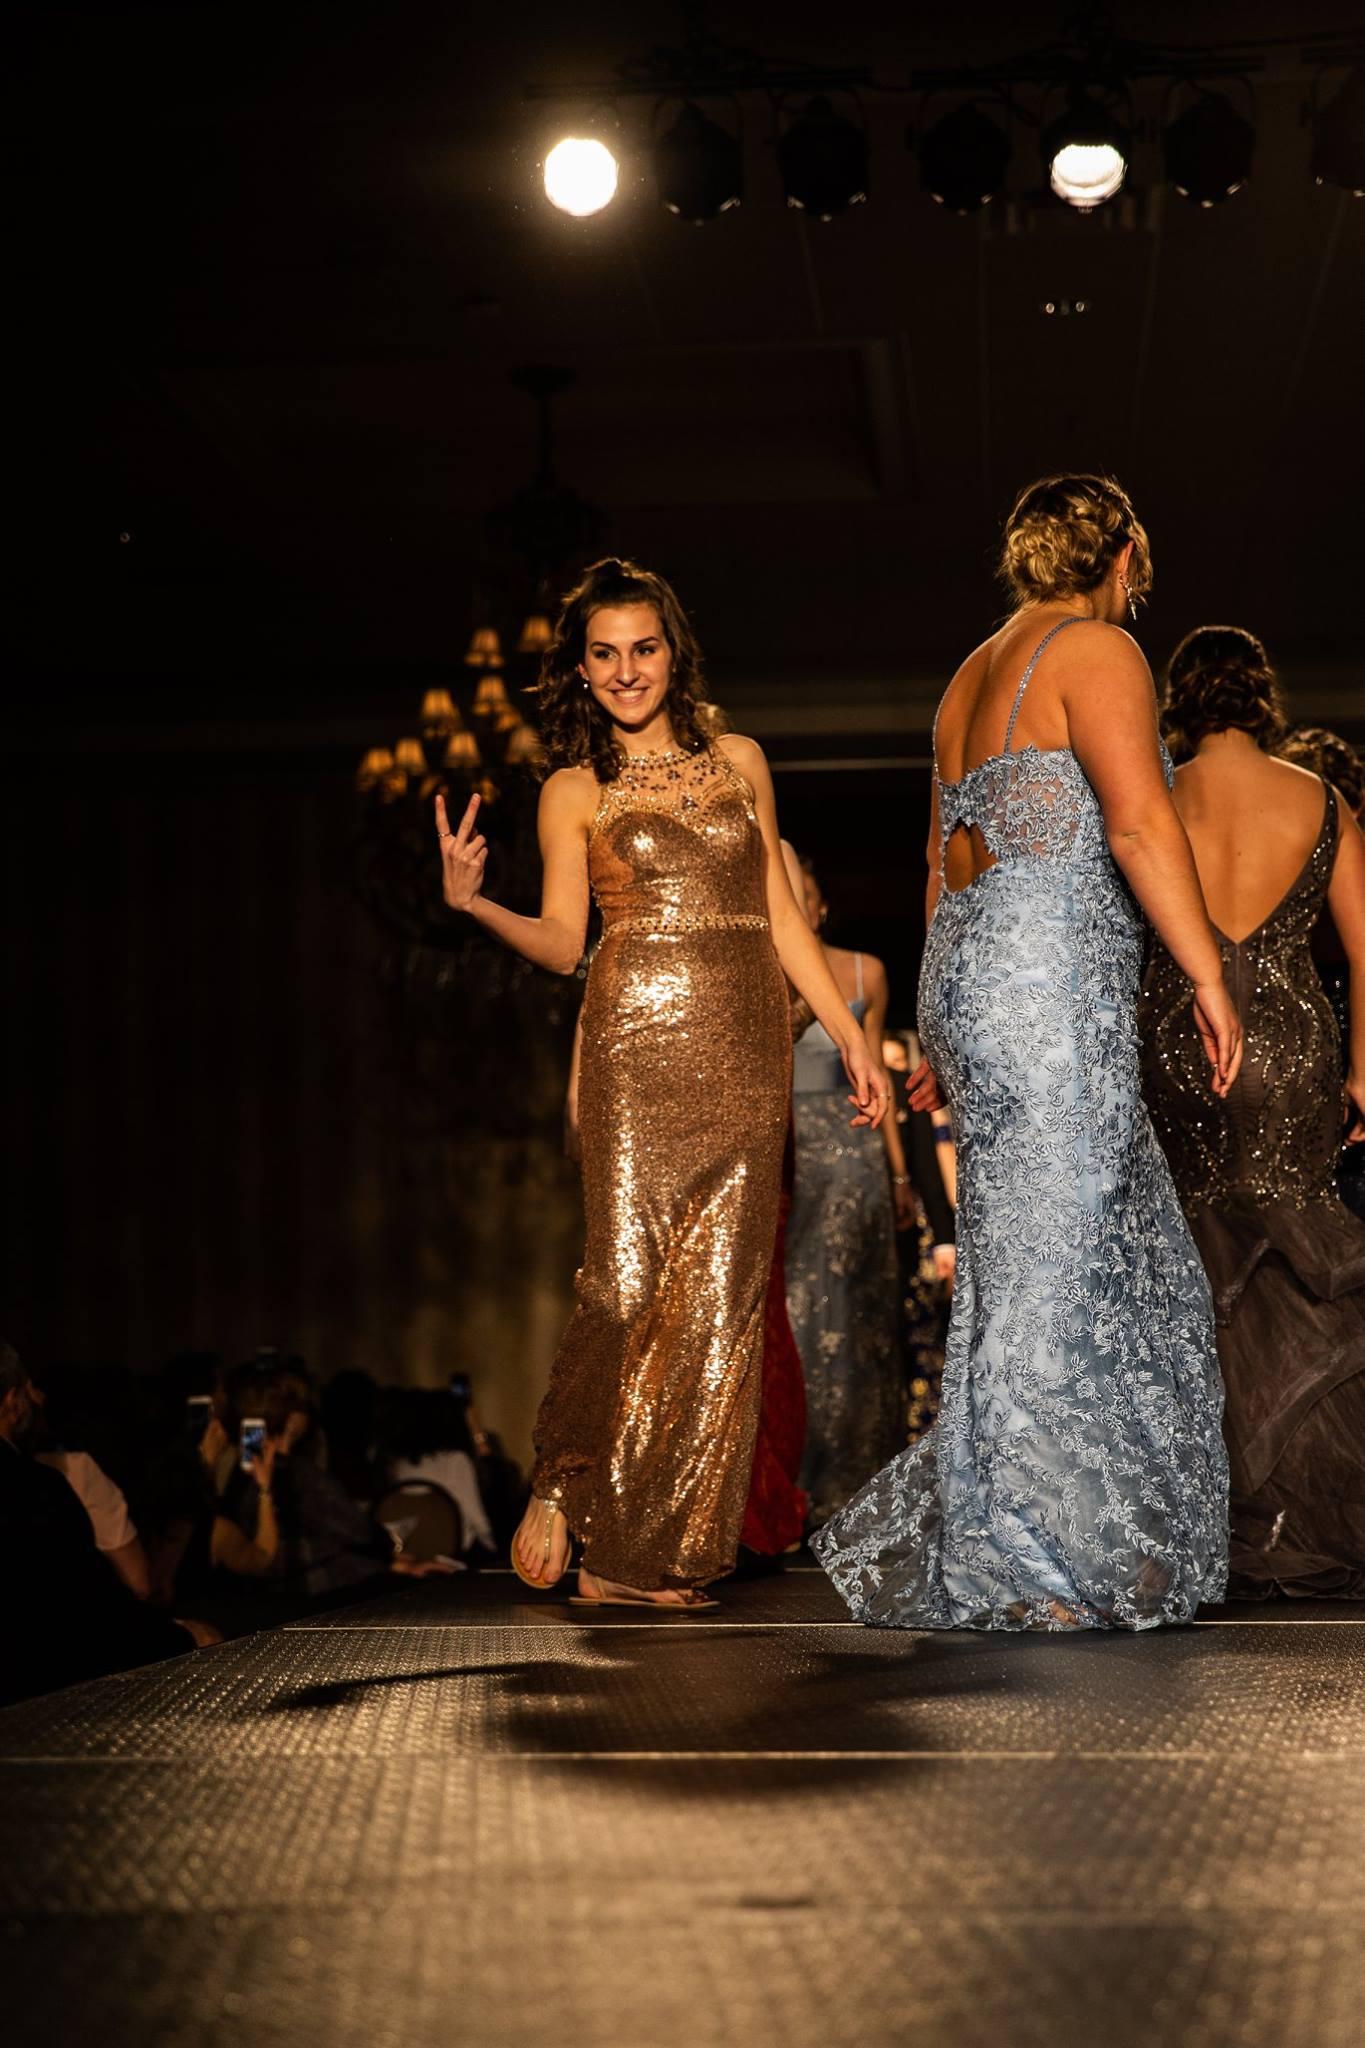 Lutheran_North_High_School_Macomb_Michigan_LHN_Fashion_Show_2019_Seniors (20).jpg